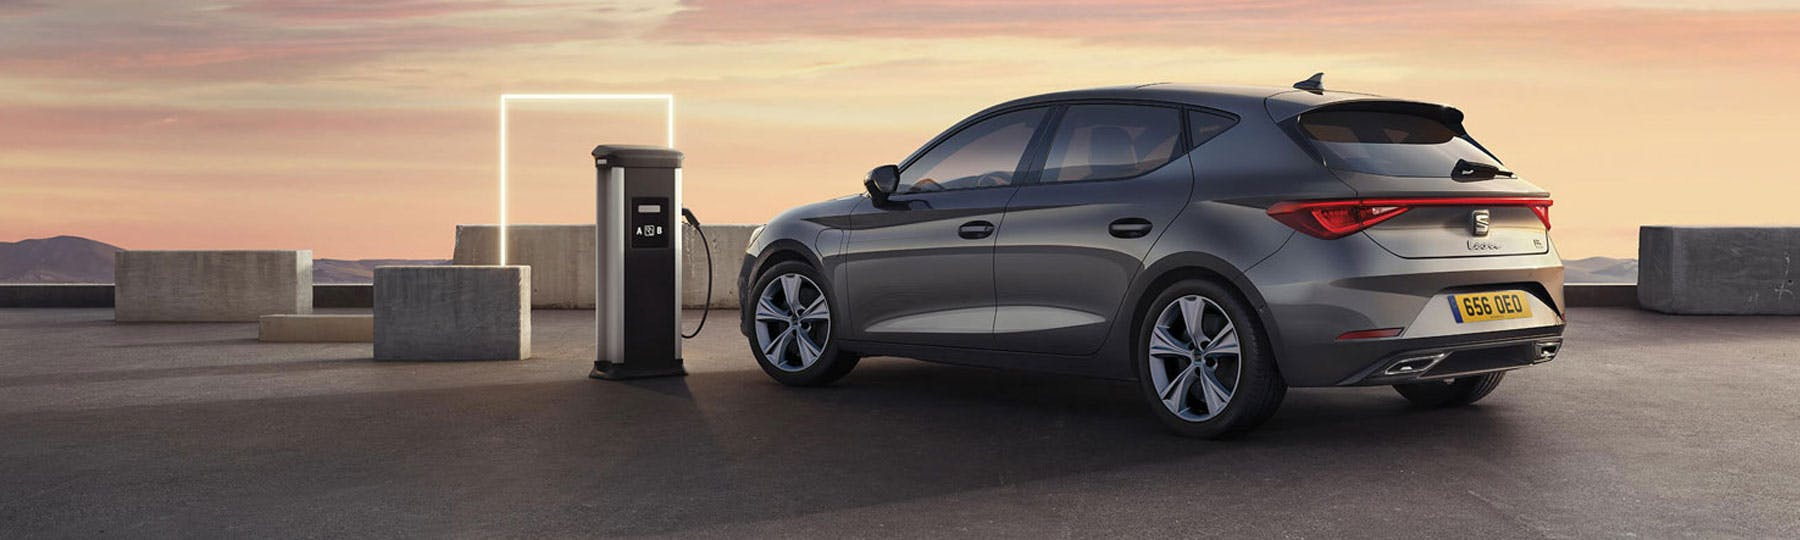 New SEAT Leon e-Hybrid